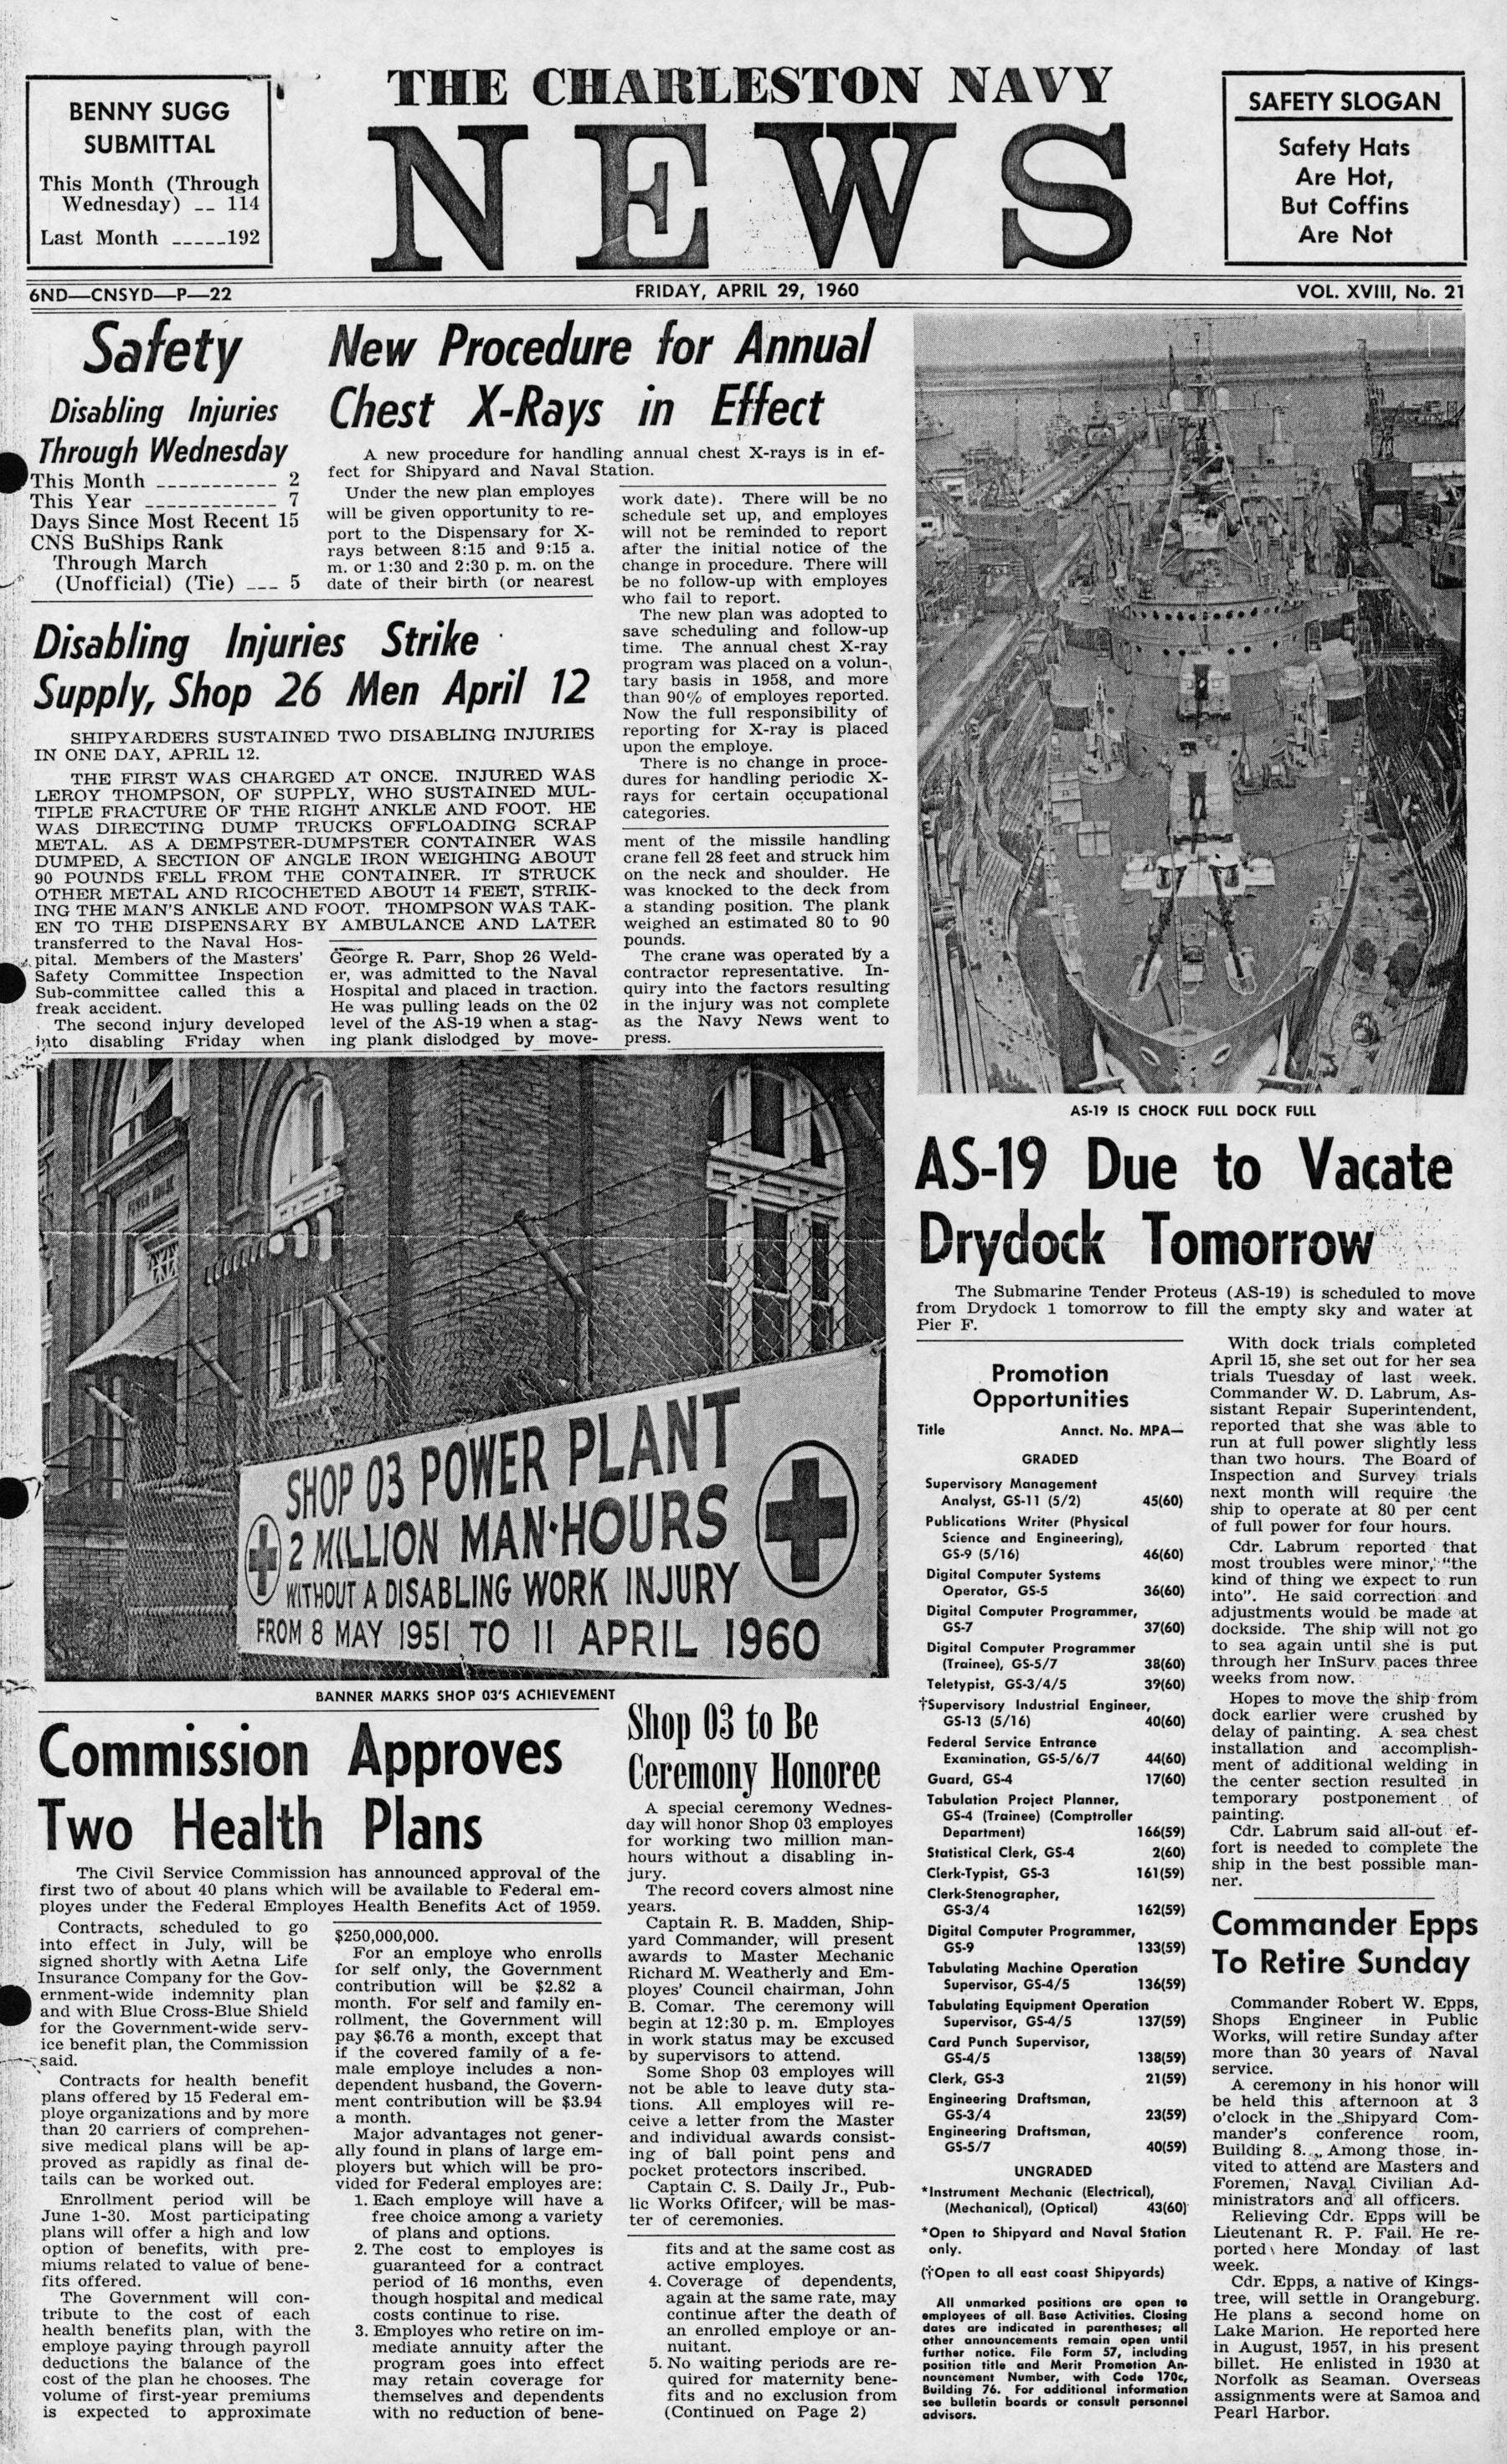 The Charleston Navy News, Volume 18, Edition 21, page i